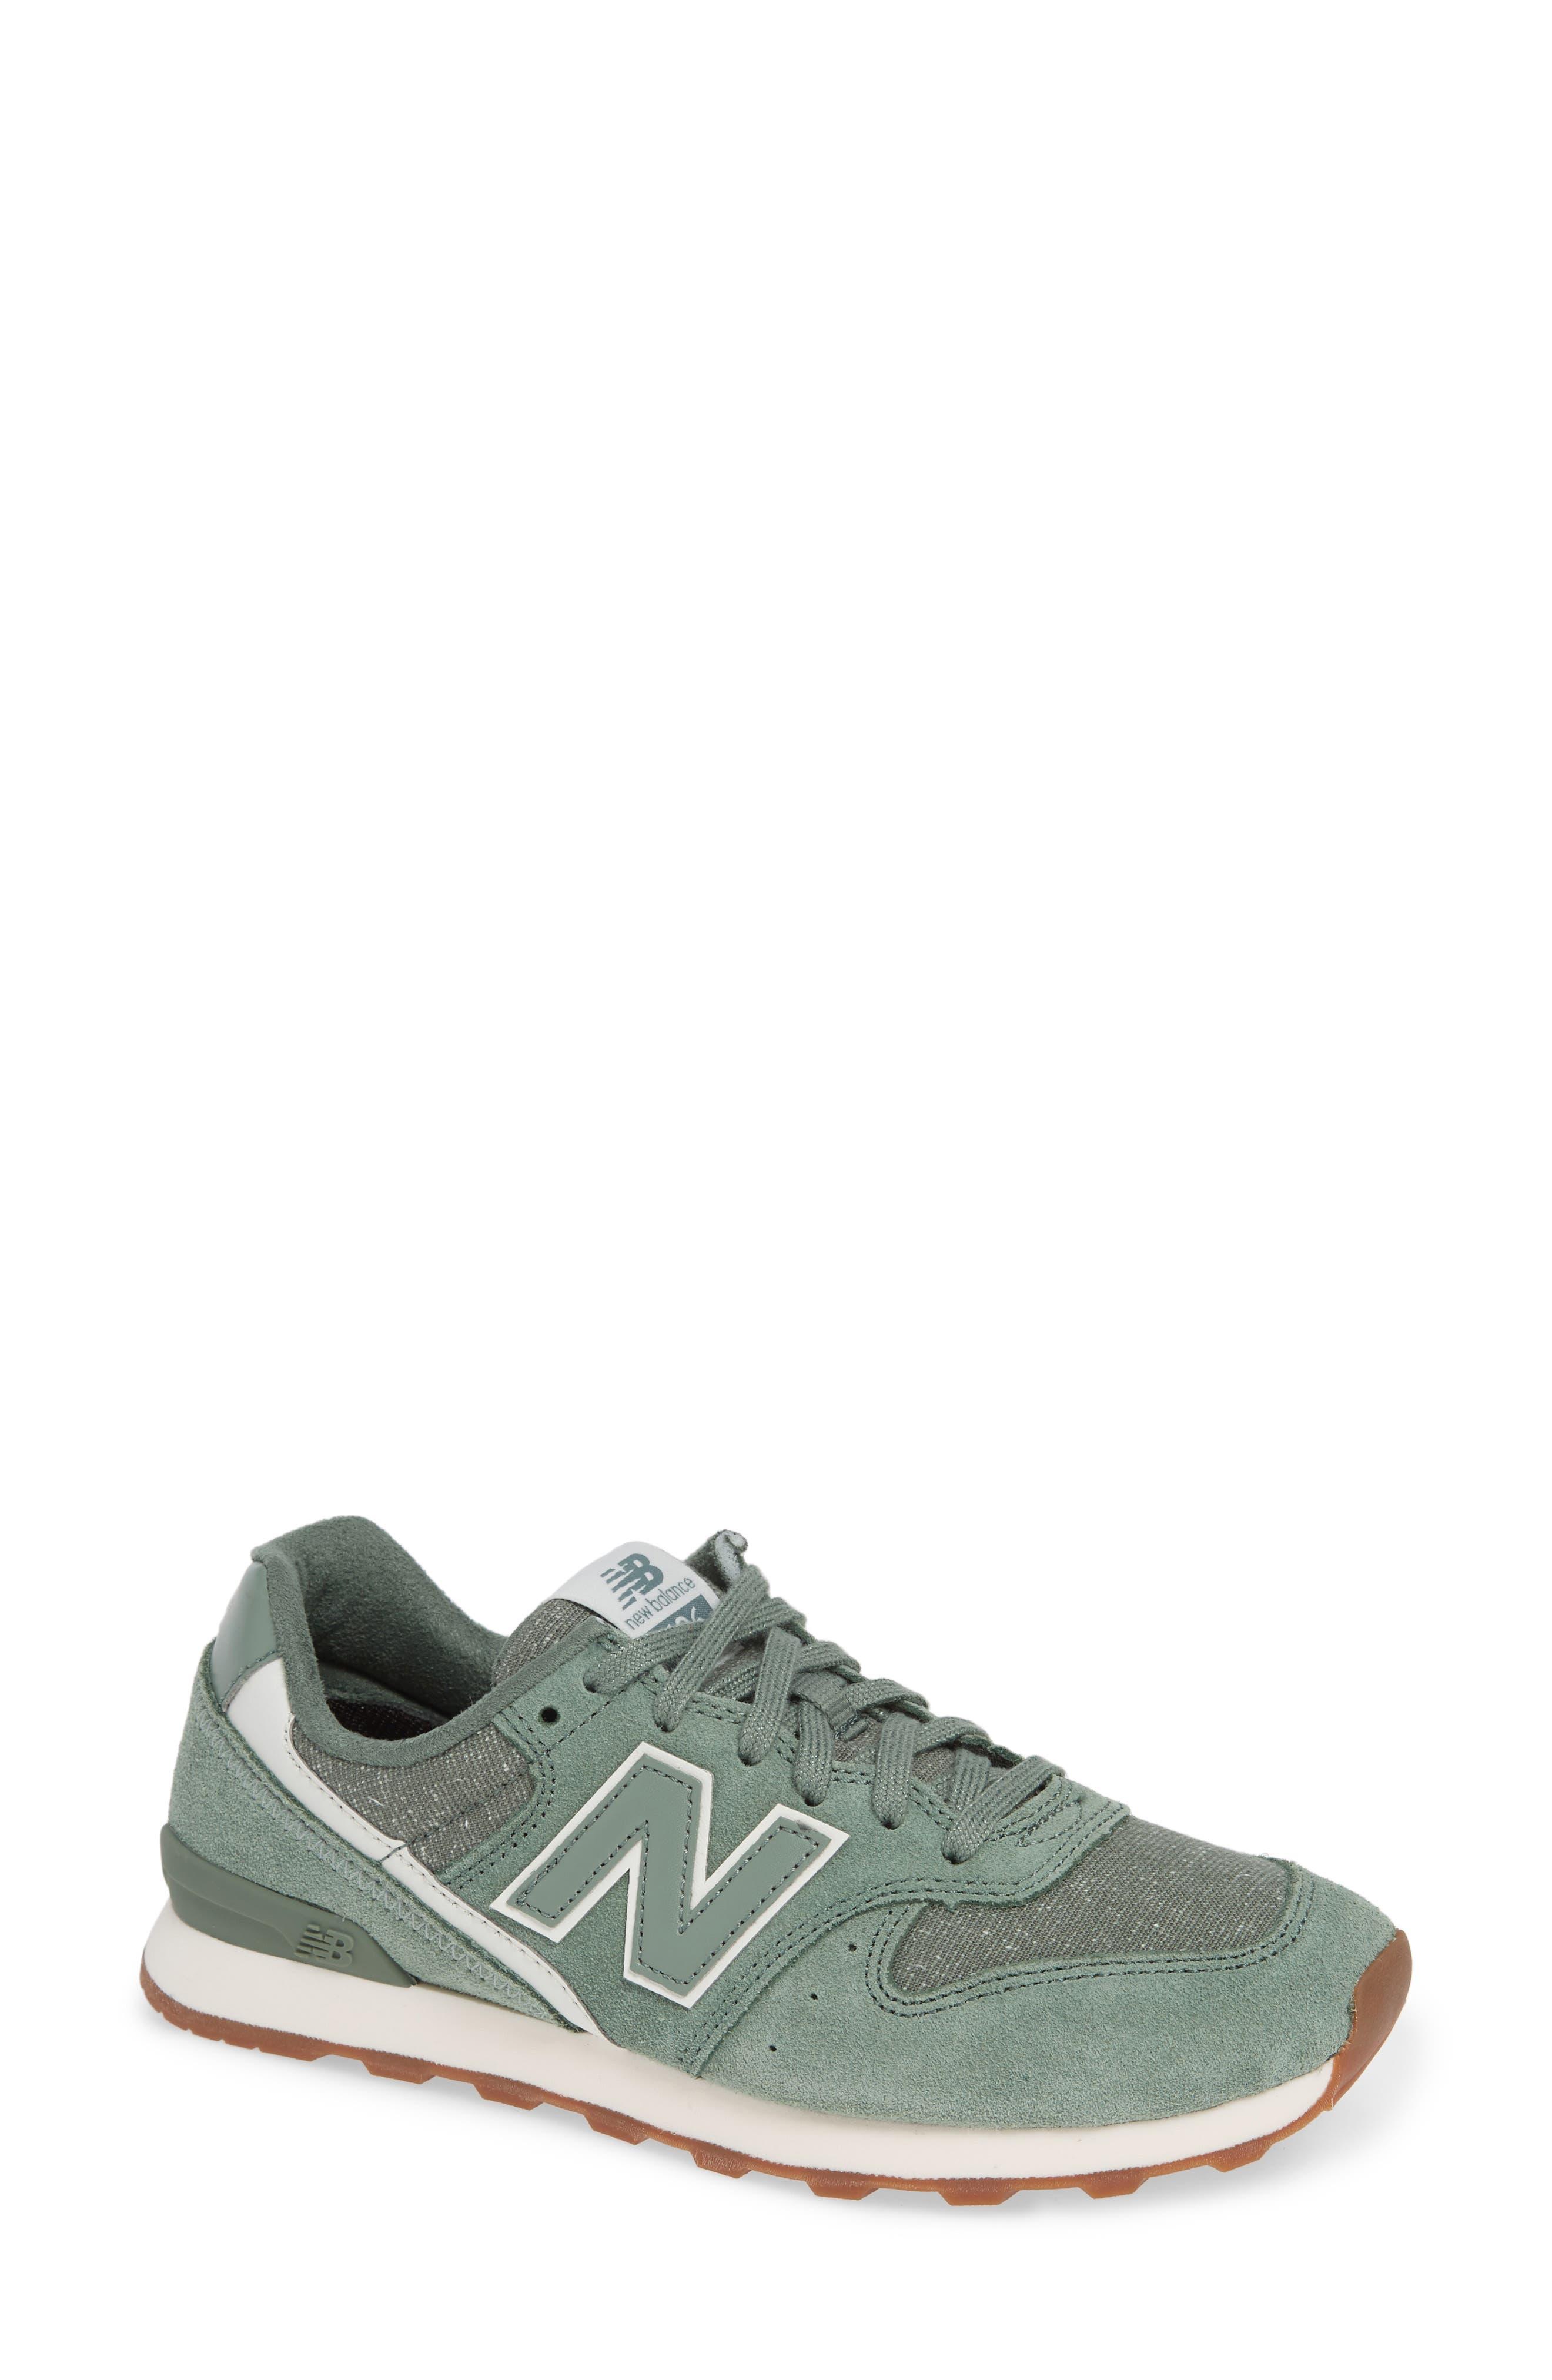 696 Sneaker,                             Main thumbnail 1, color,                             300